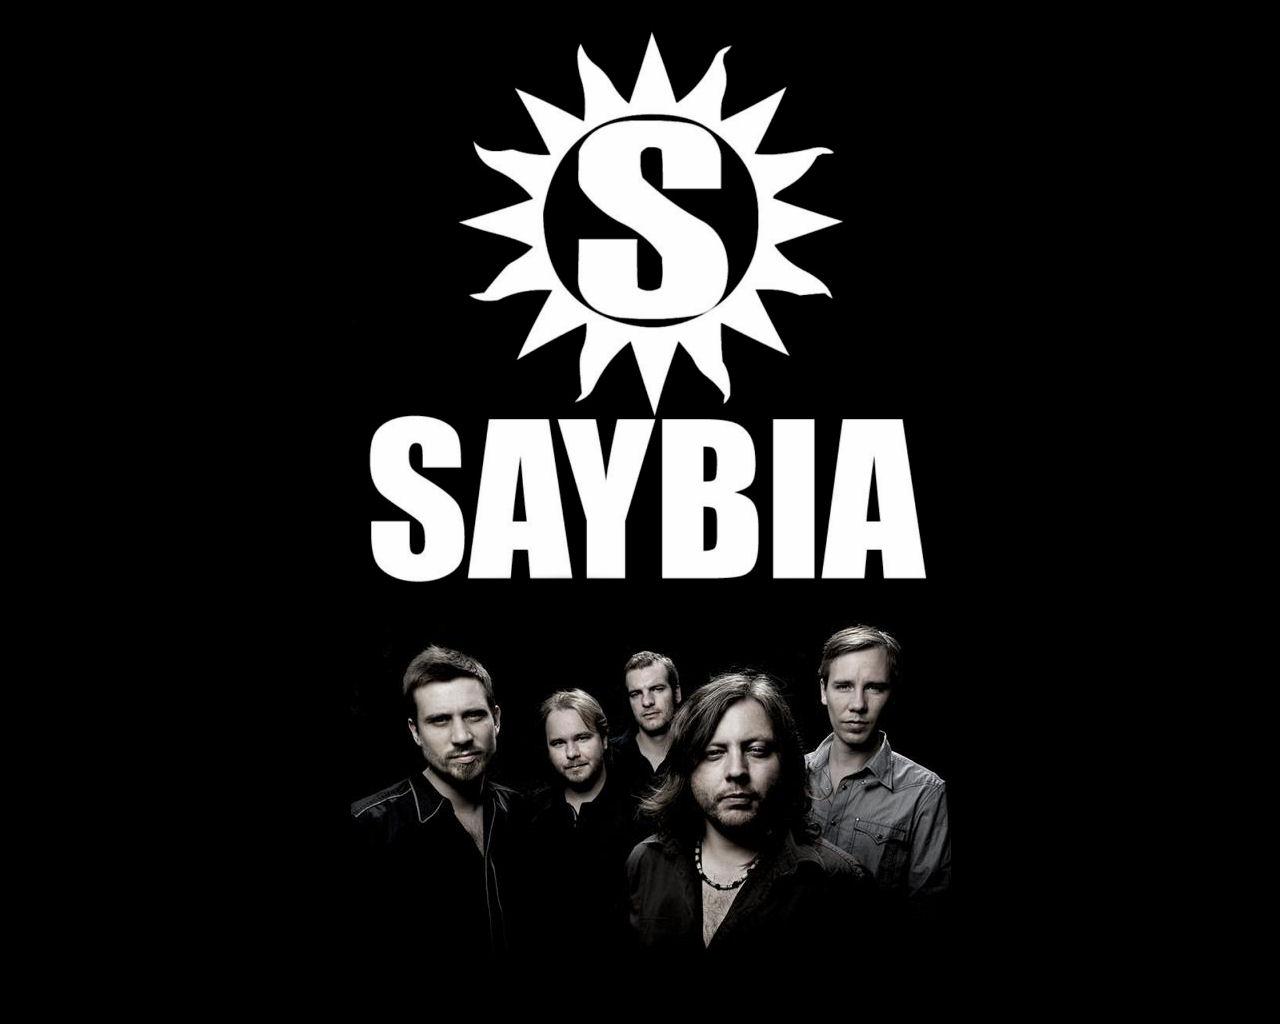 Saybia second you sleep full album zip by haidiorealjets issuu.